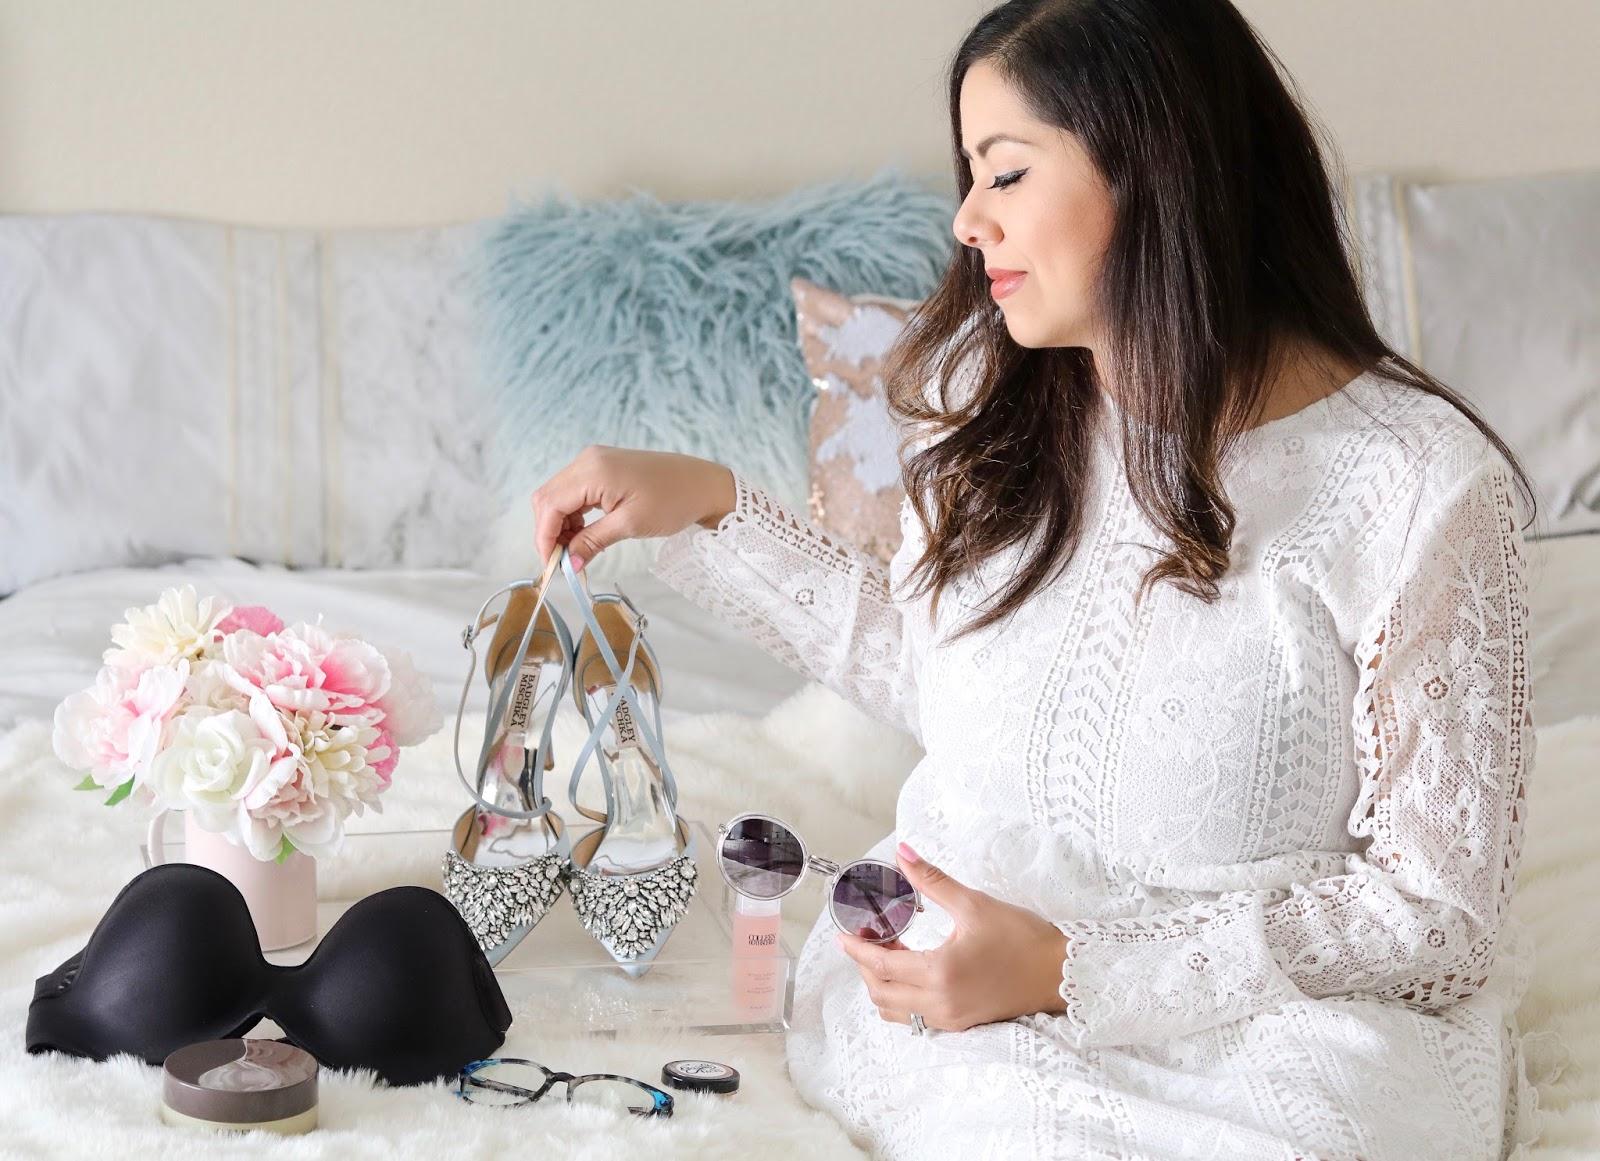 Badgley Mishcka heels, socal lifestyle blogger